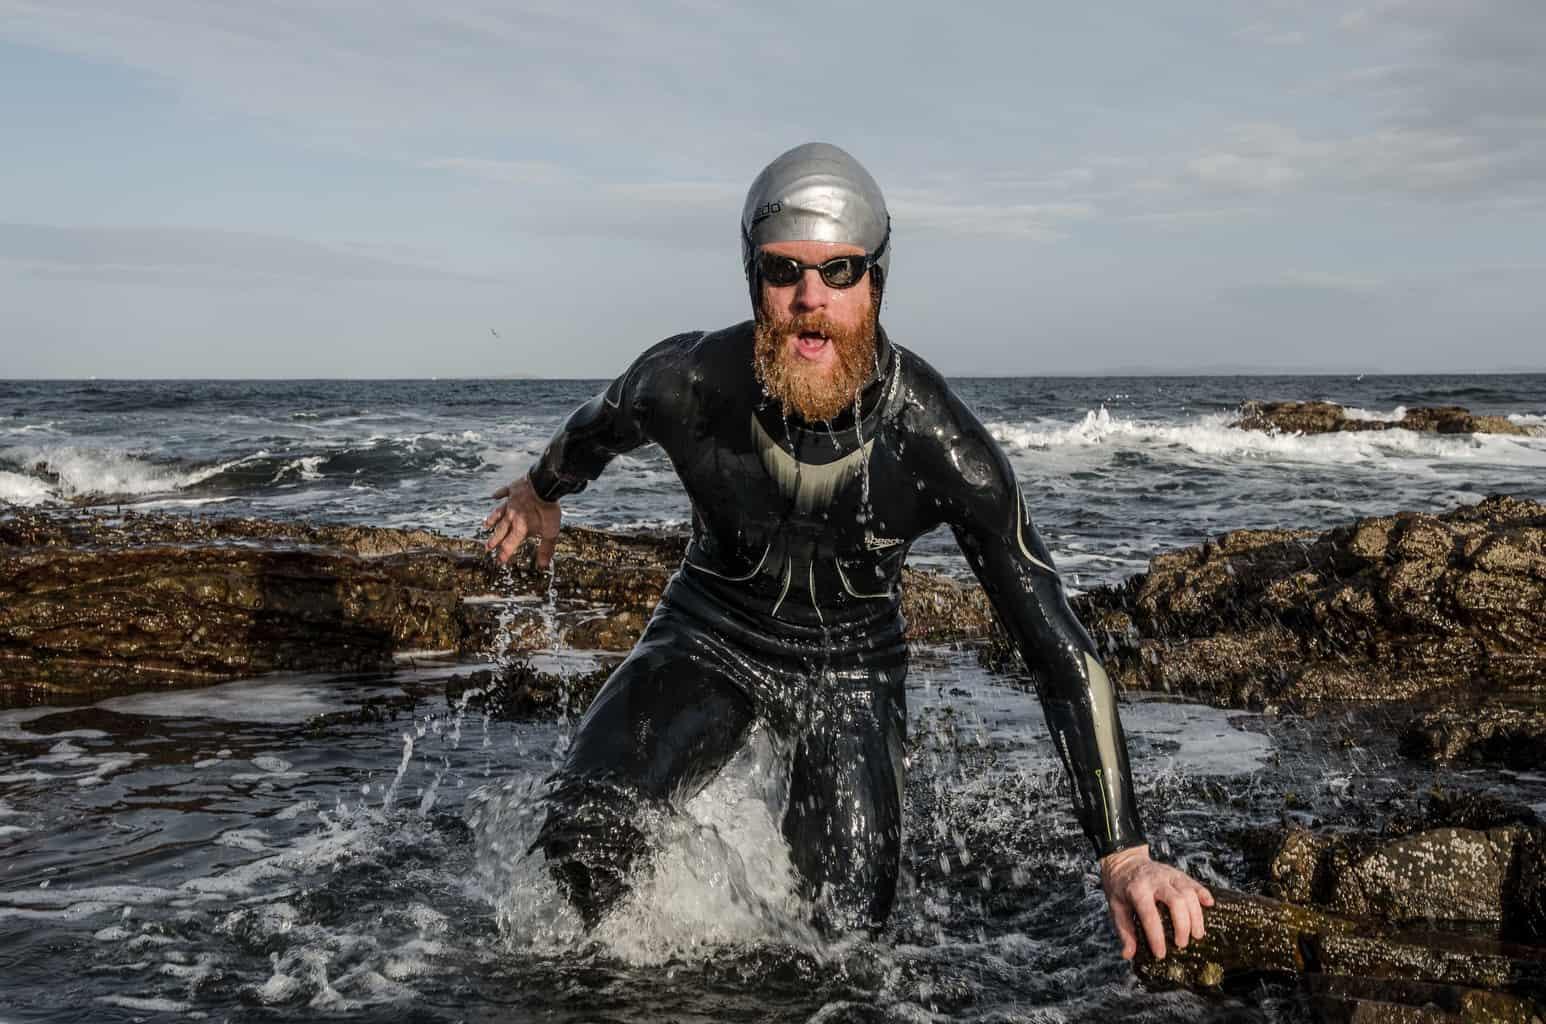 Endurance athlete Sean Conway